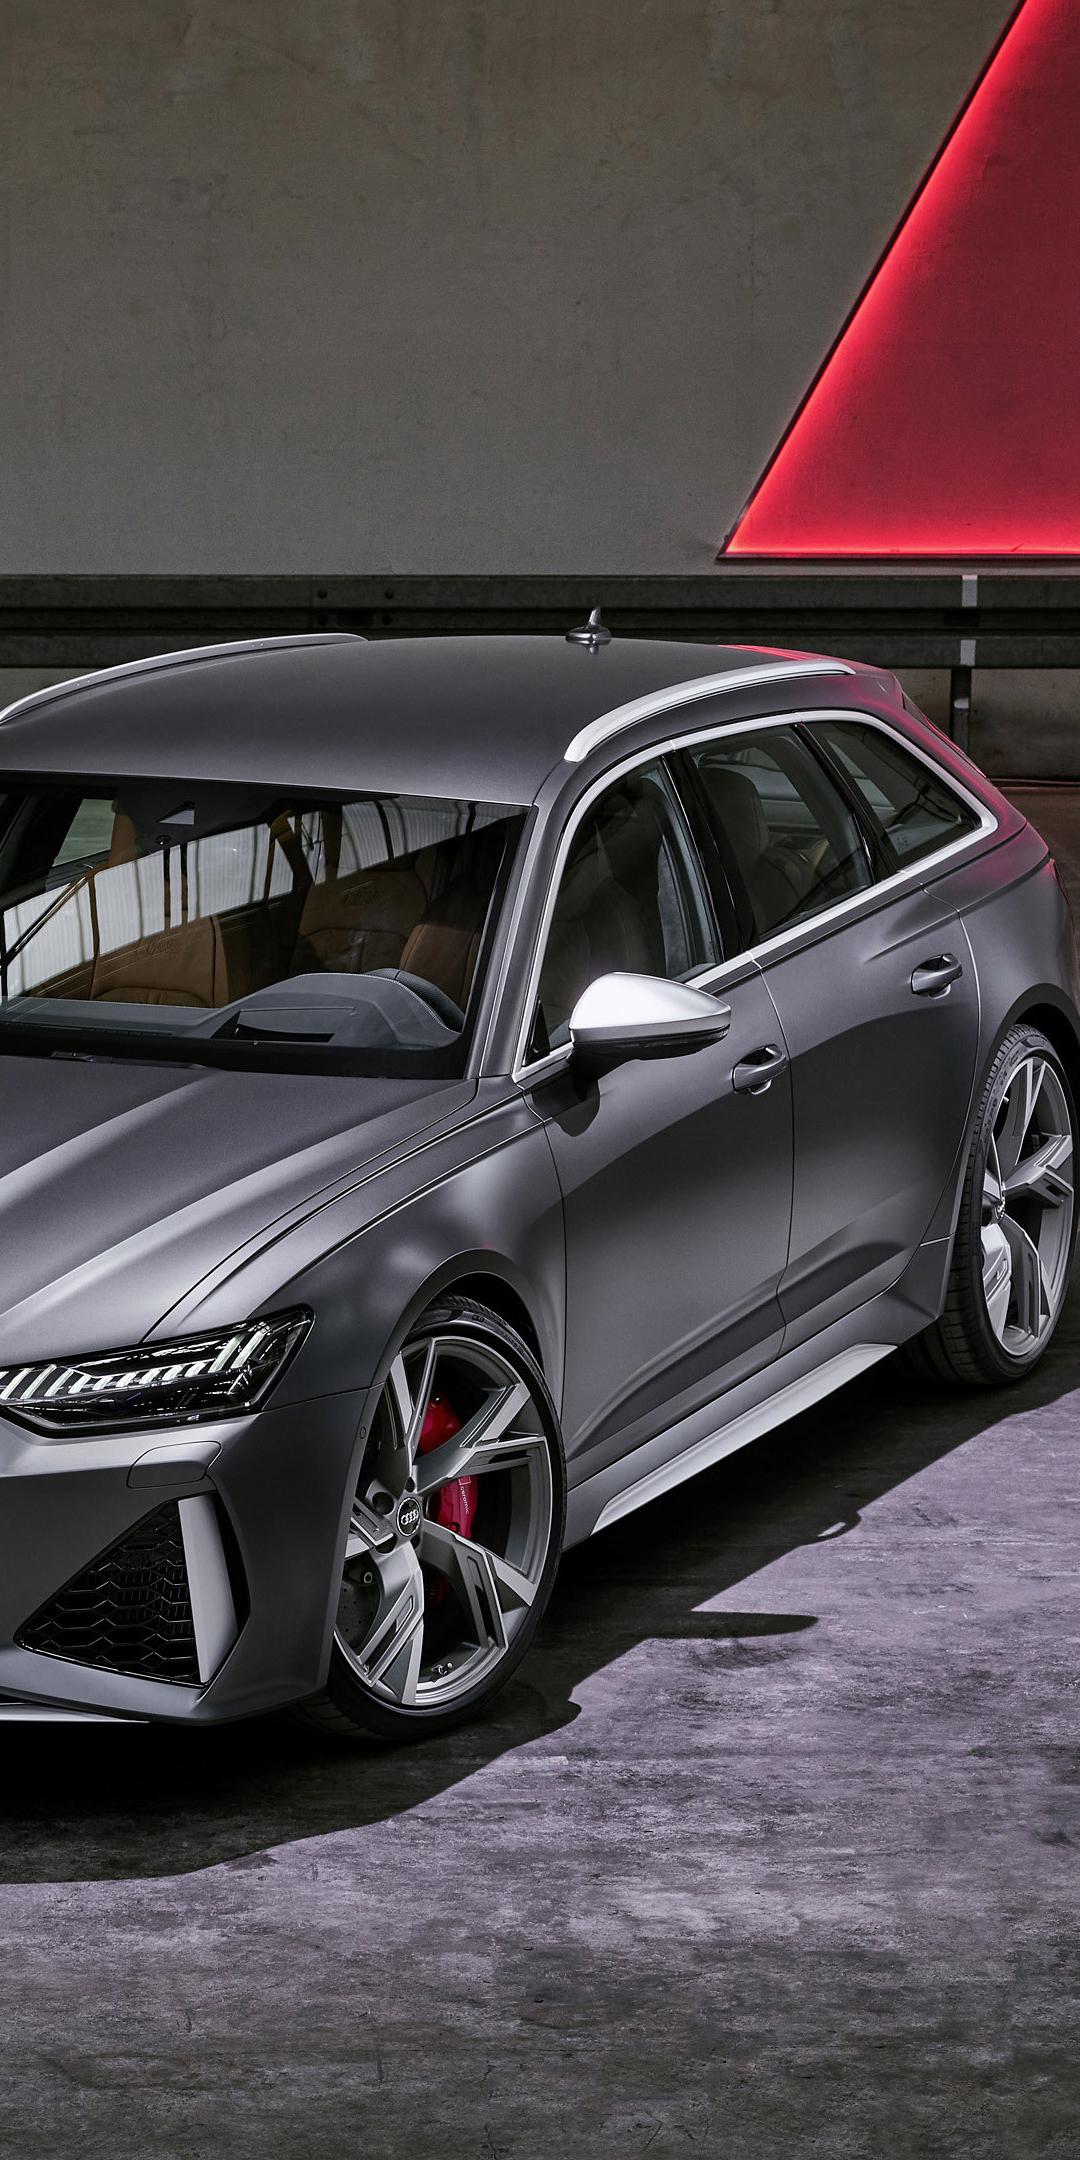 Download 1080x2160 Wallpaper 2019 Audi Rs6 Avant Car Honor